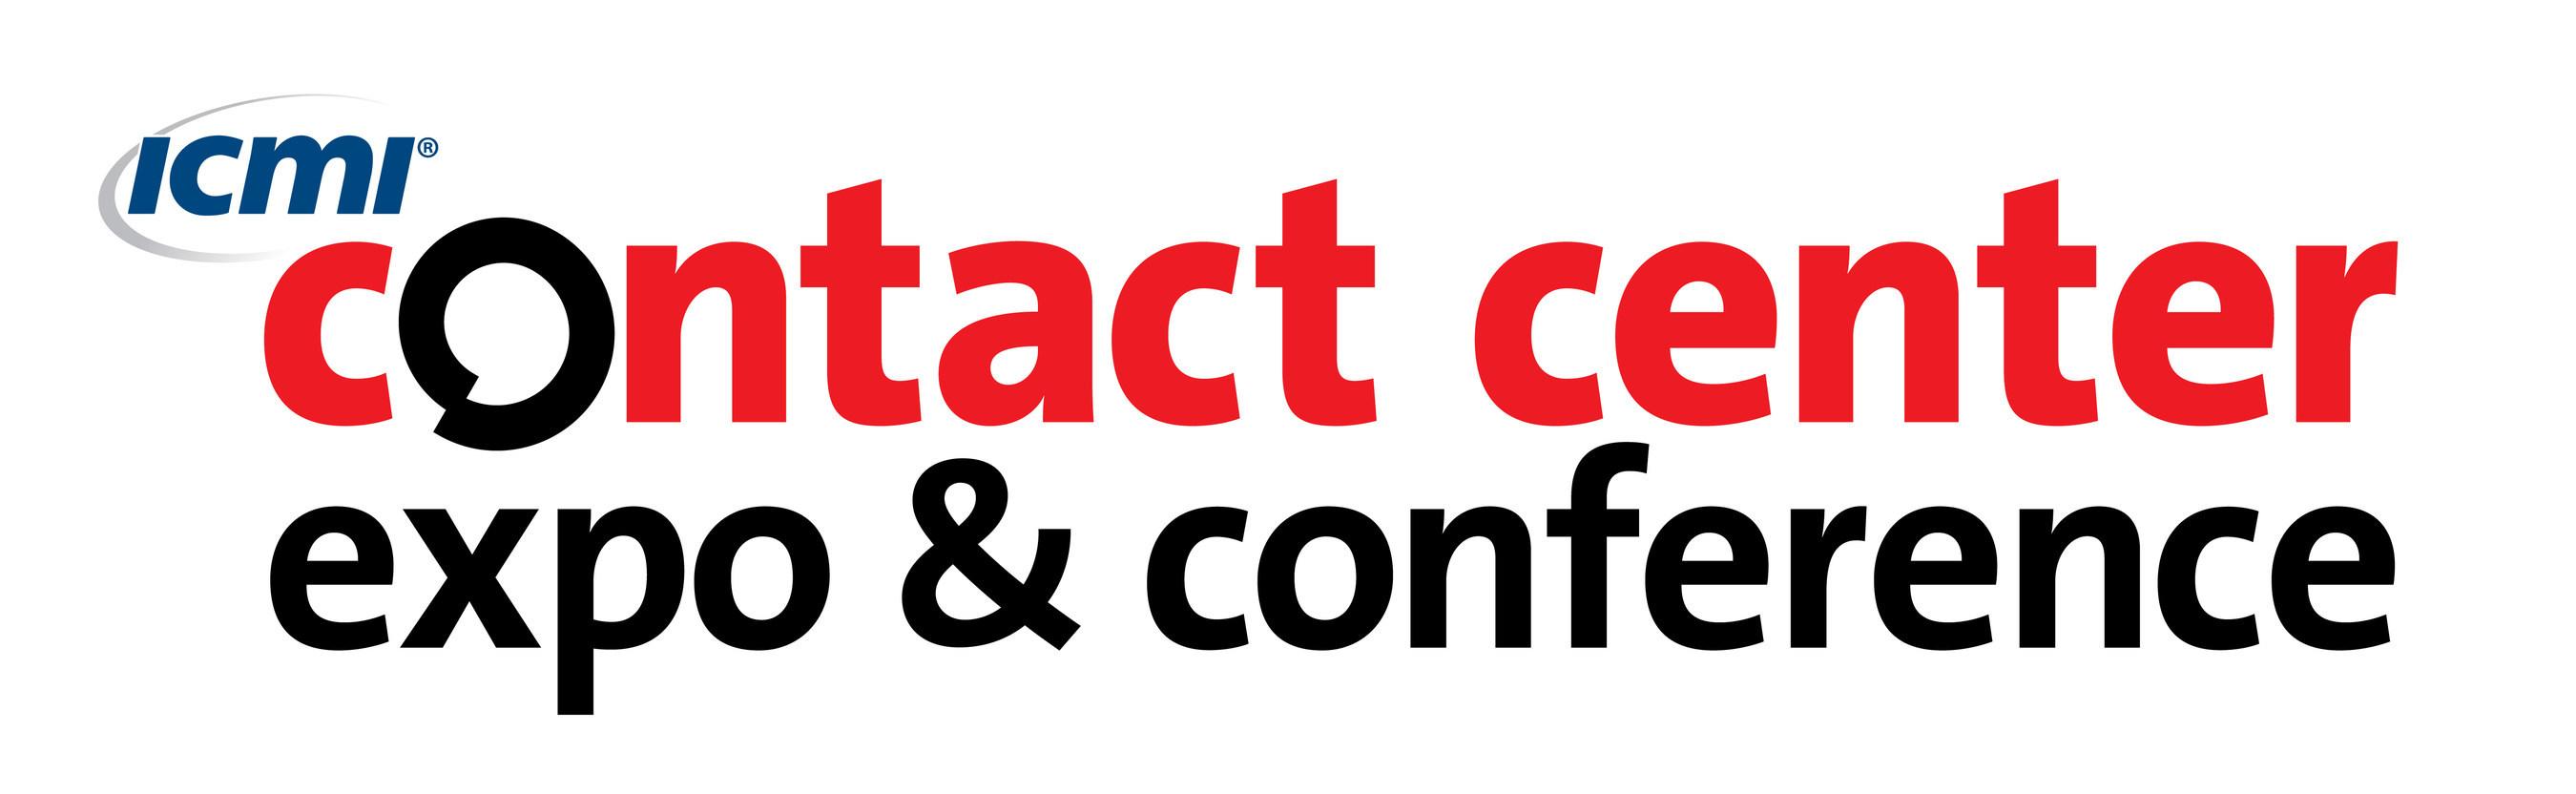 ICMI Announces Program for 2017 Contact Center Expo & Conference in Orlando